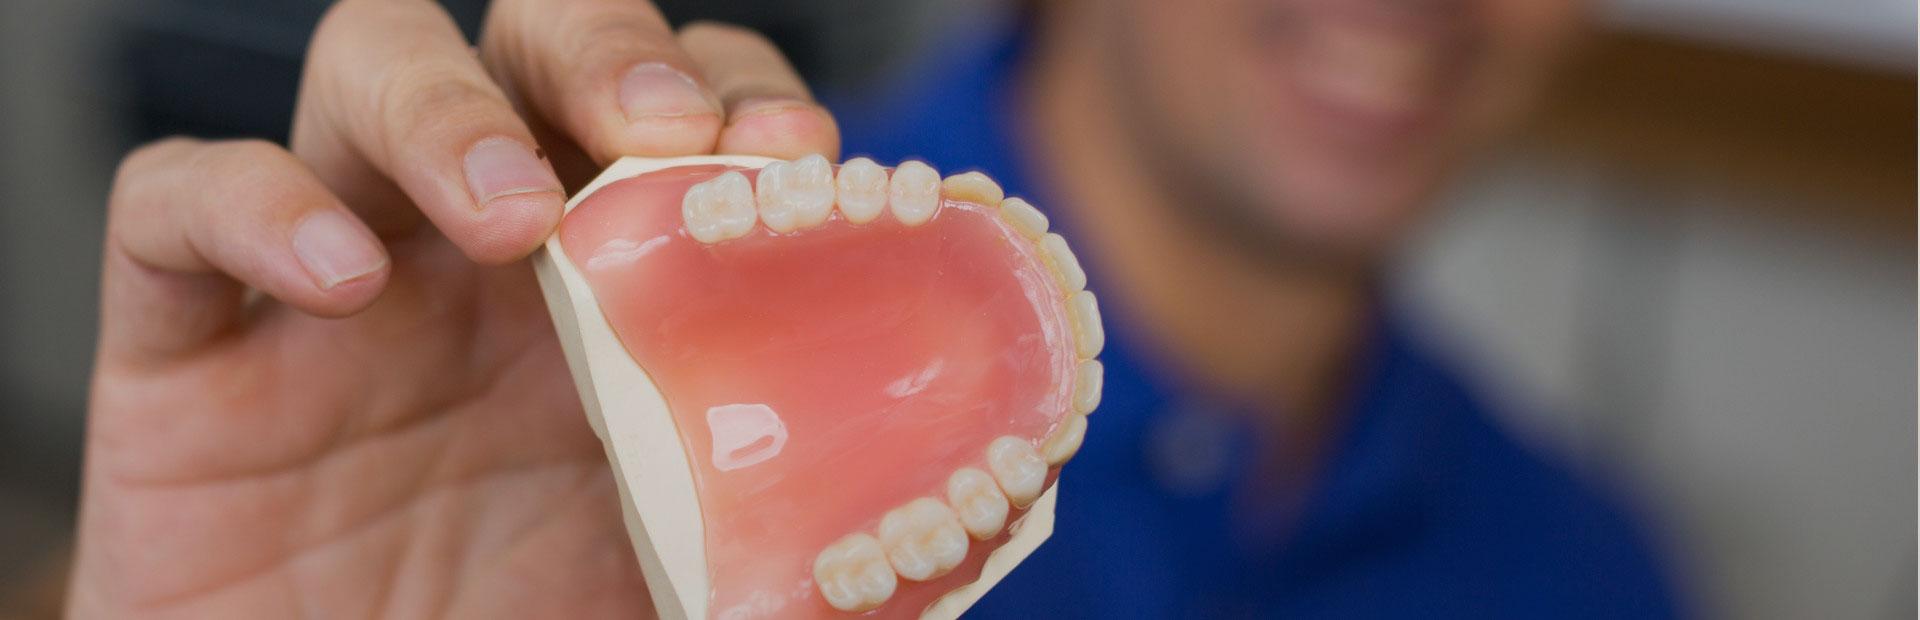 Dentist showing denture model